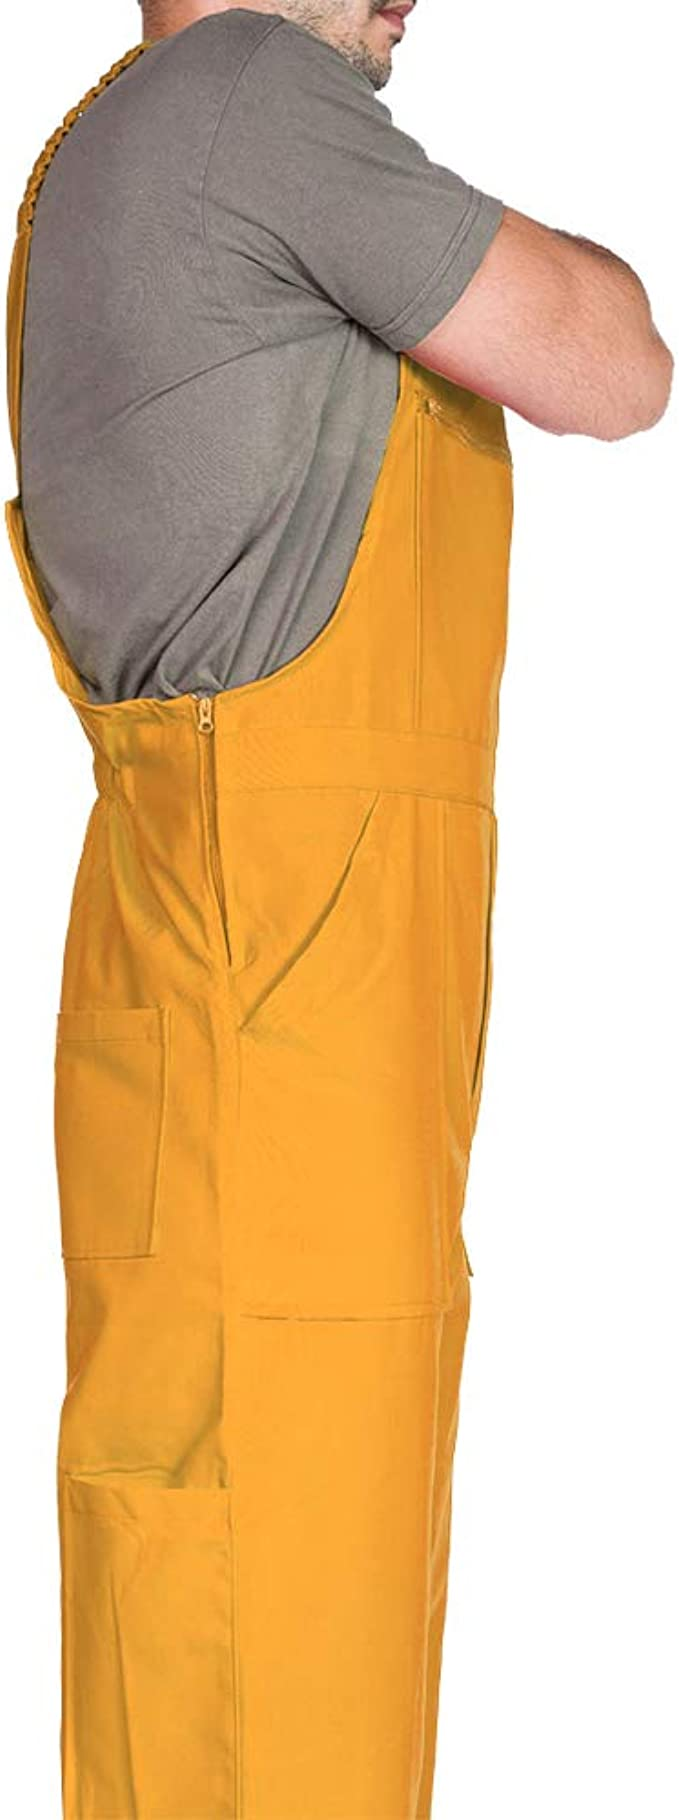 Pantalones con peto de trabajo para hombre, Made in EU, Mono de ...